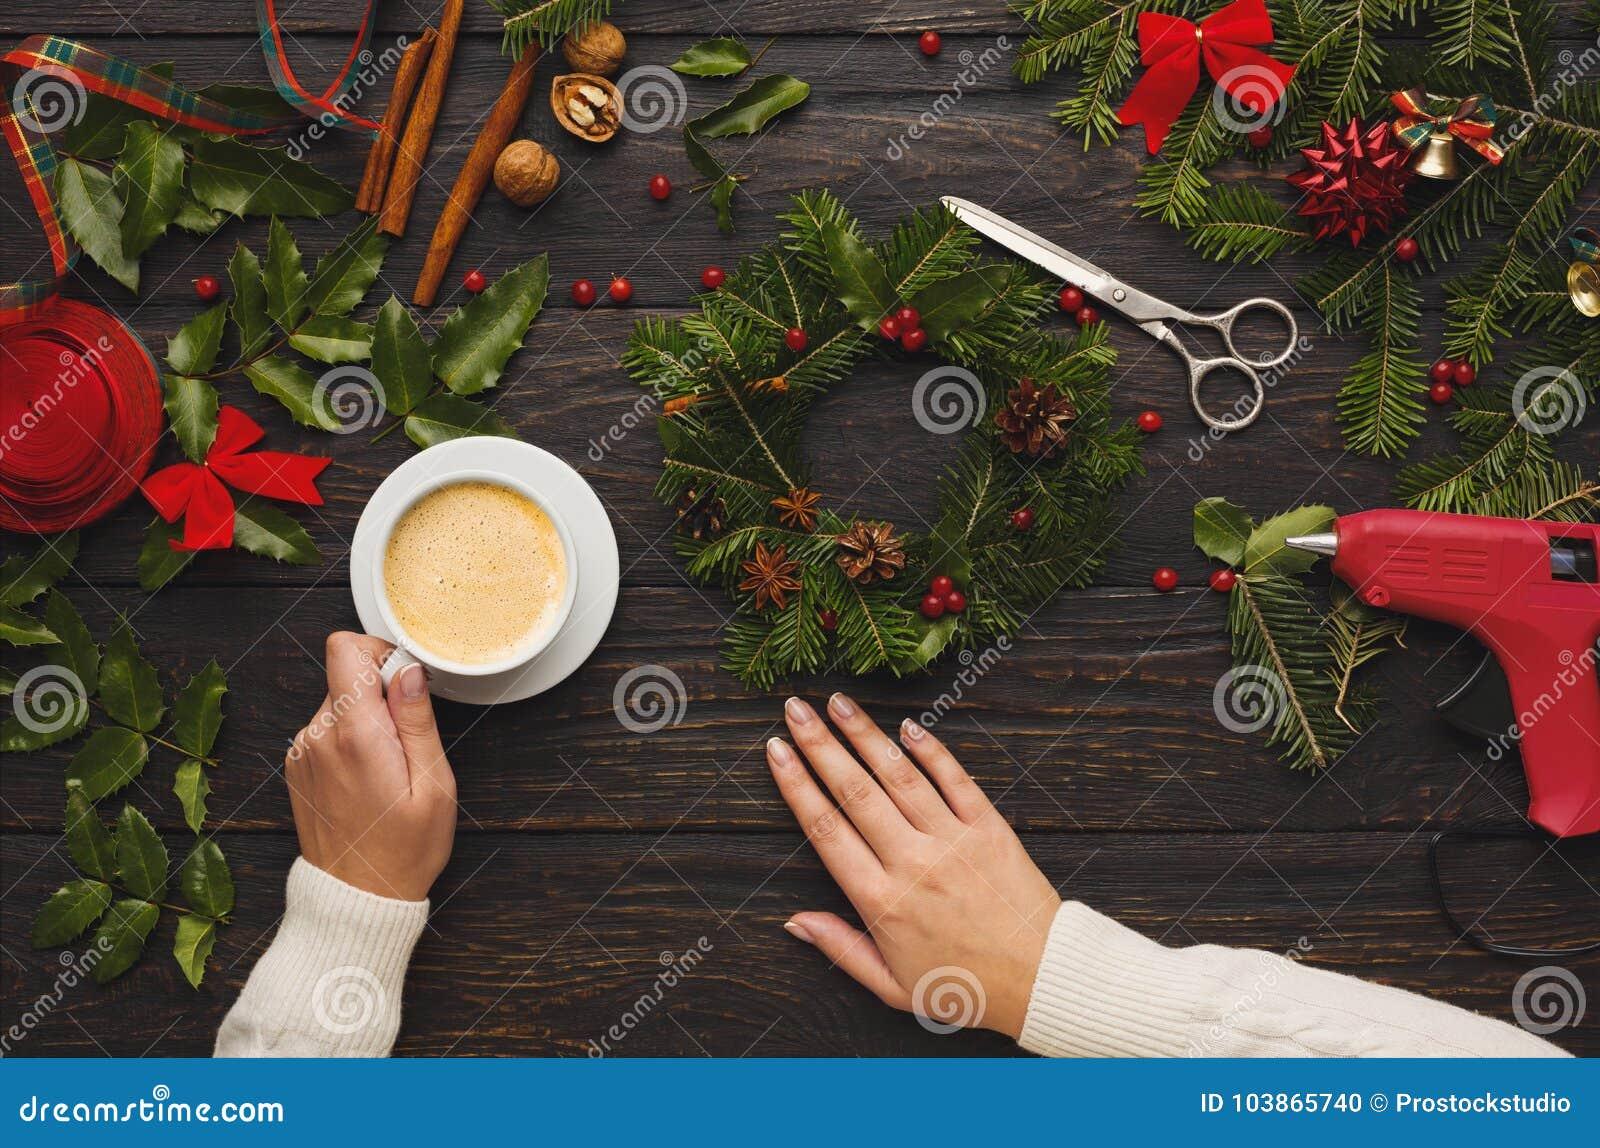 Prepare For Xmas Creative Craft Wreath Making Christmas Symbols